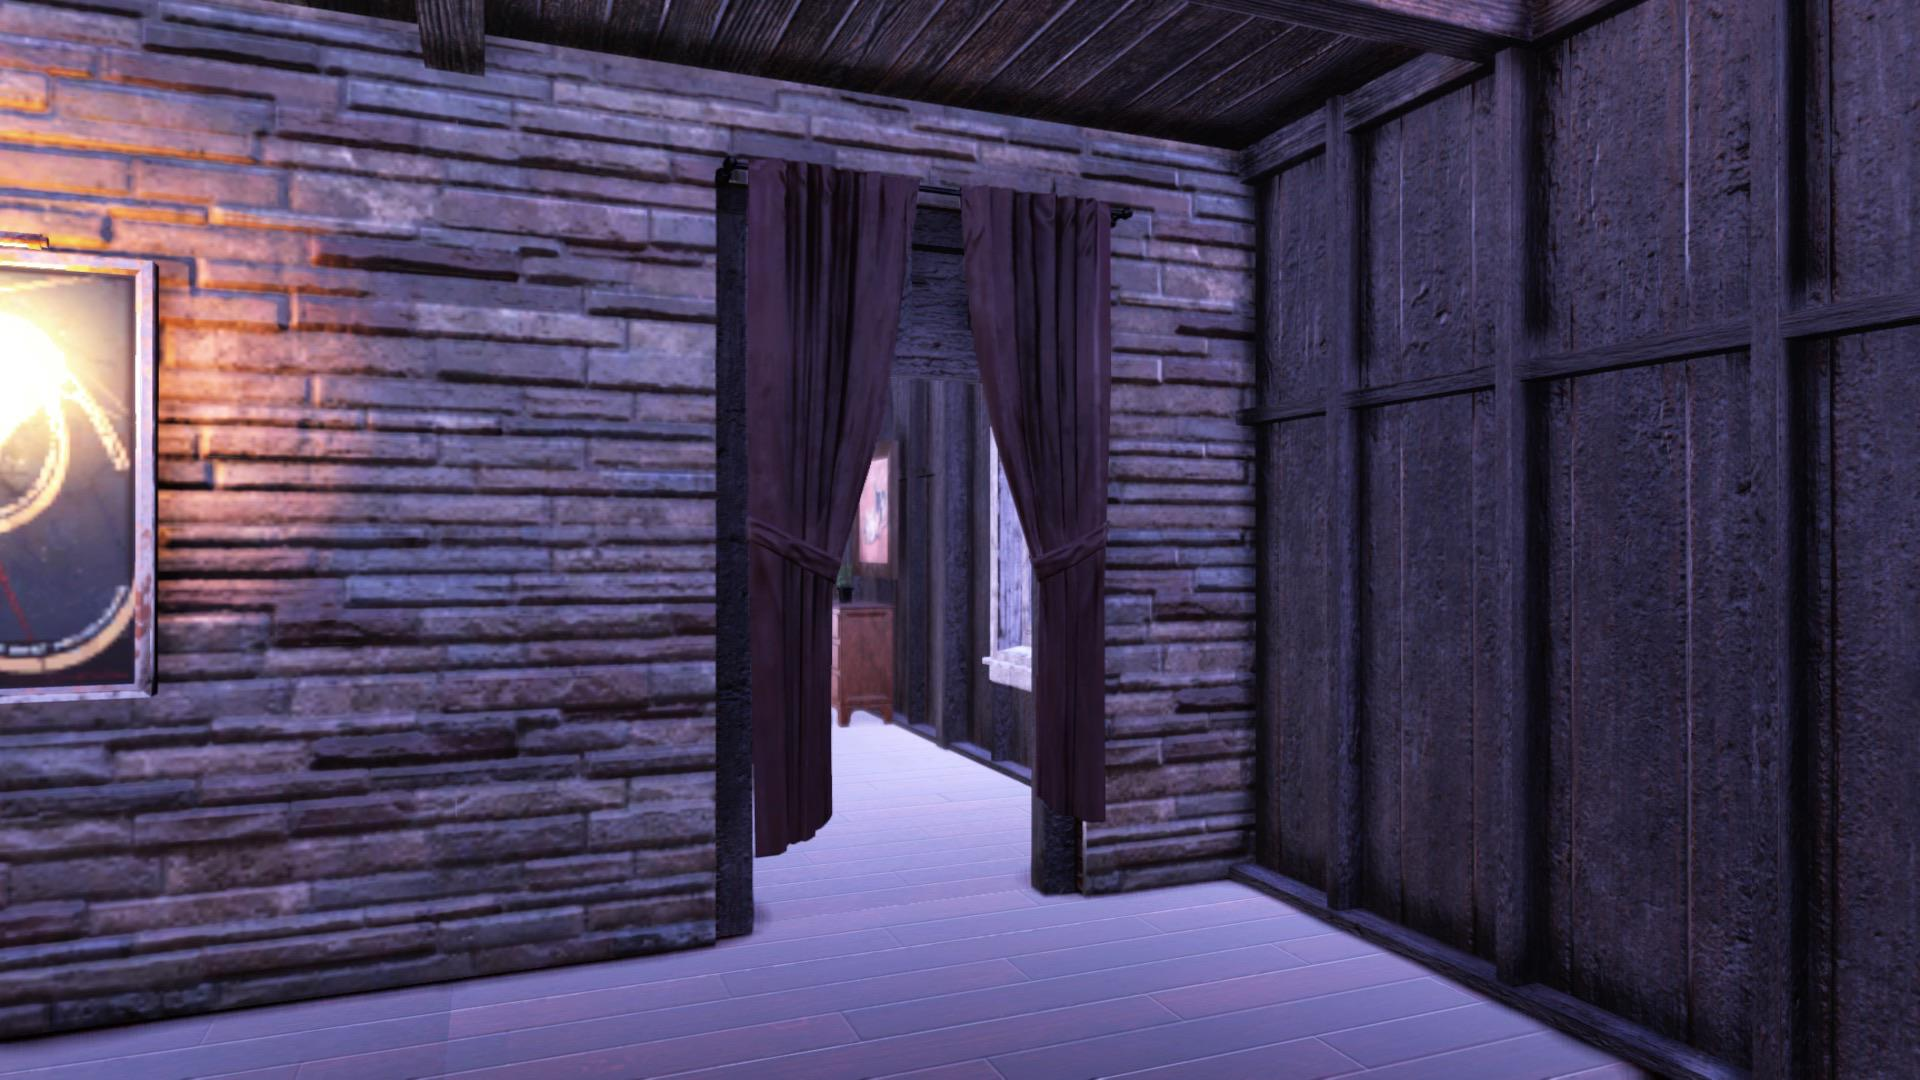 curtains work really well on open door